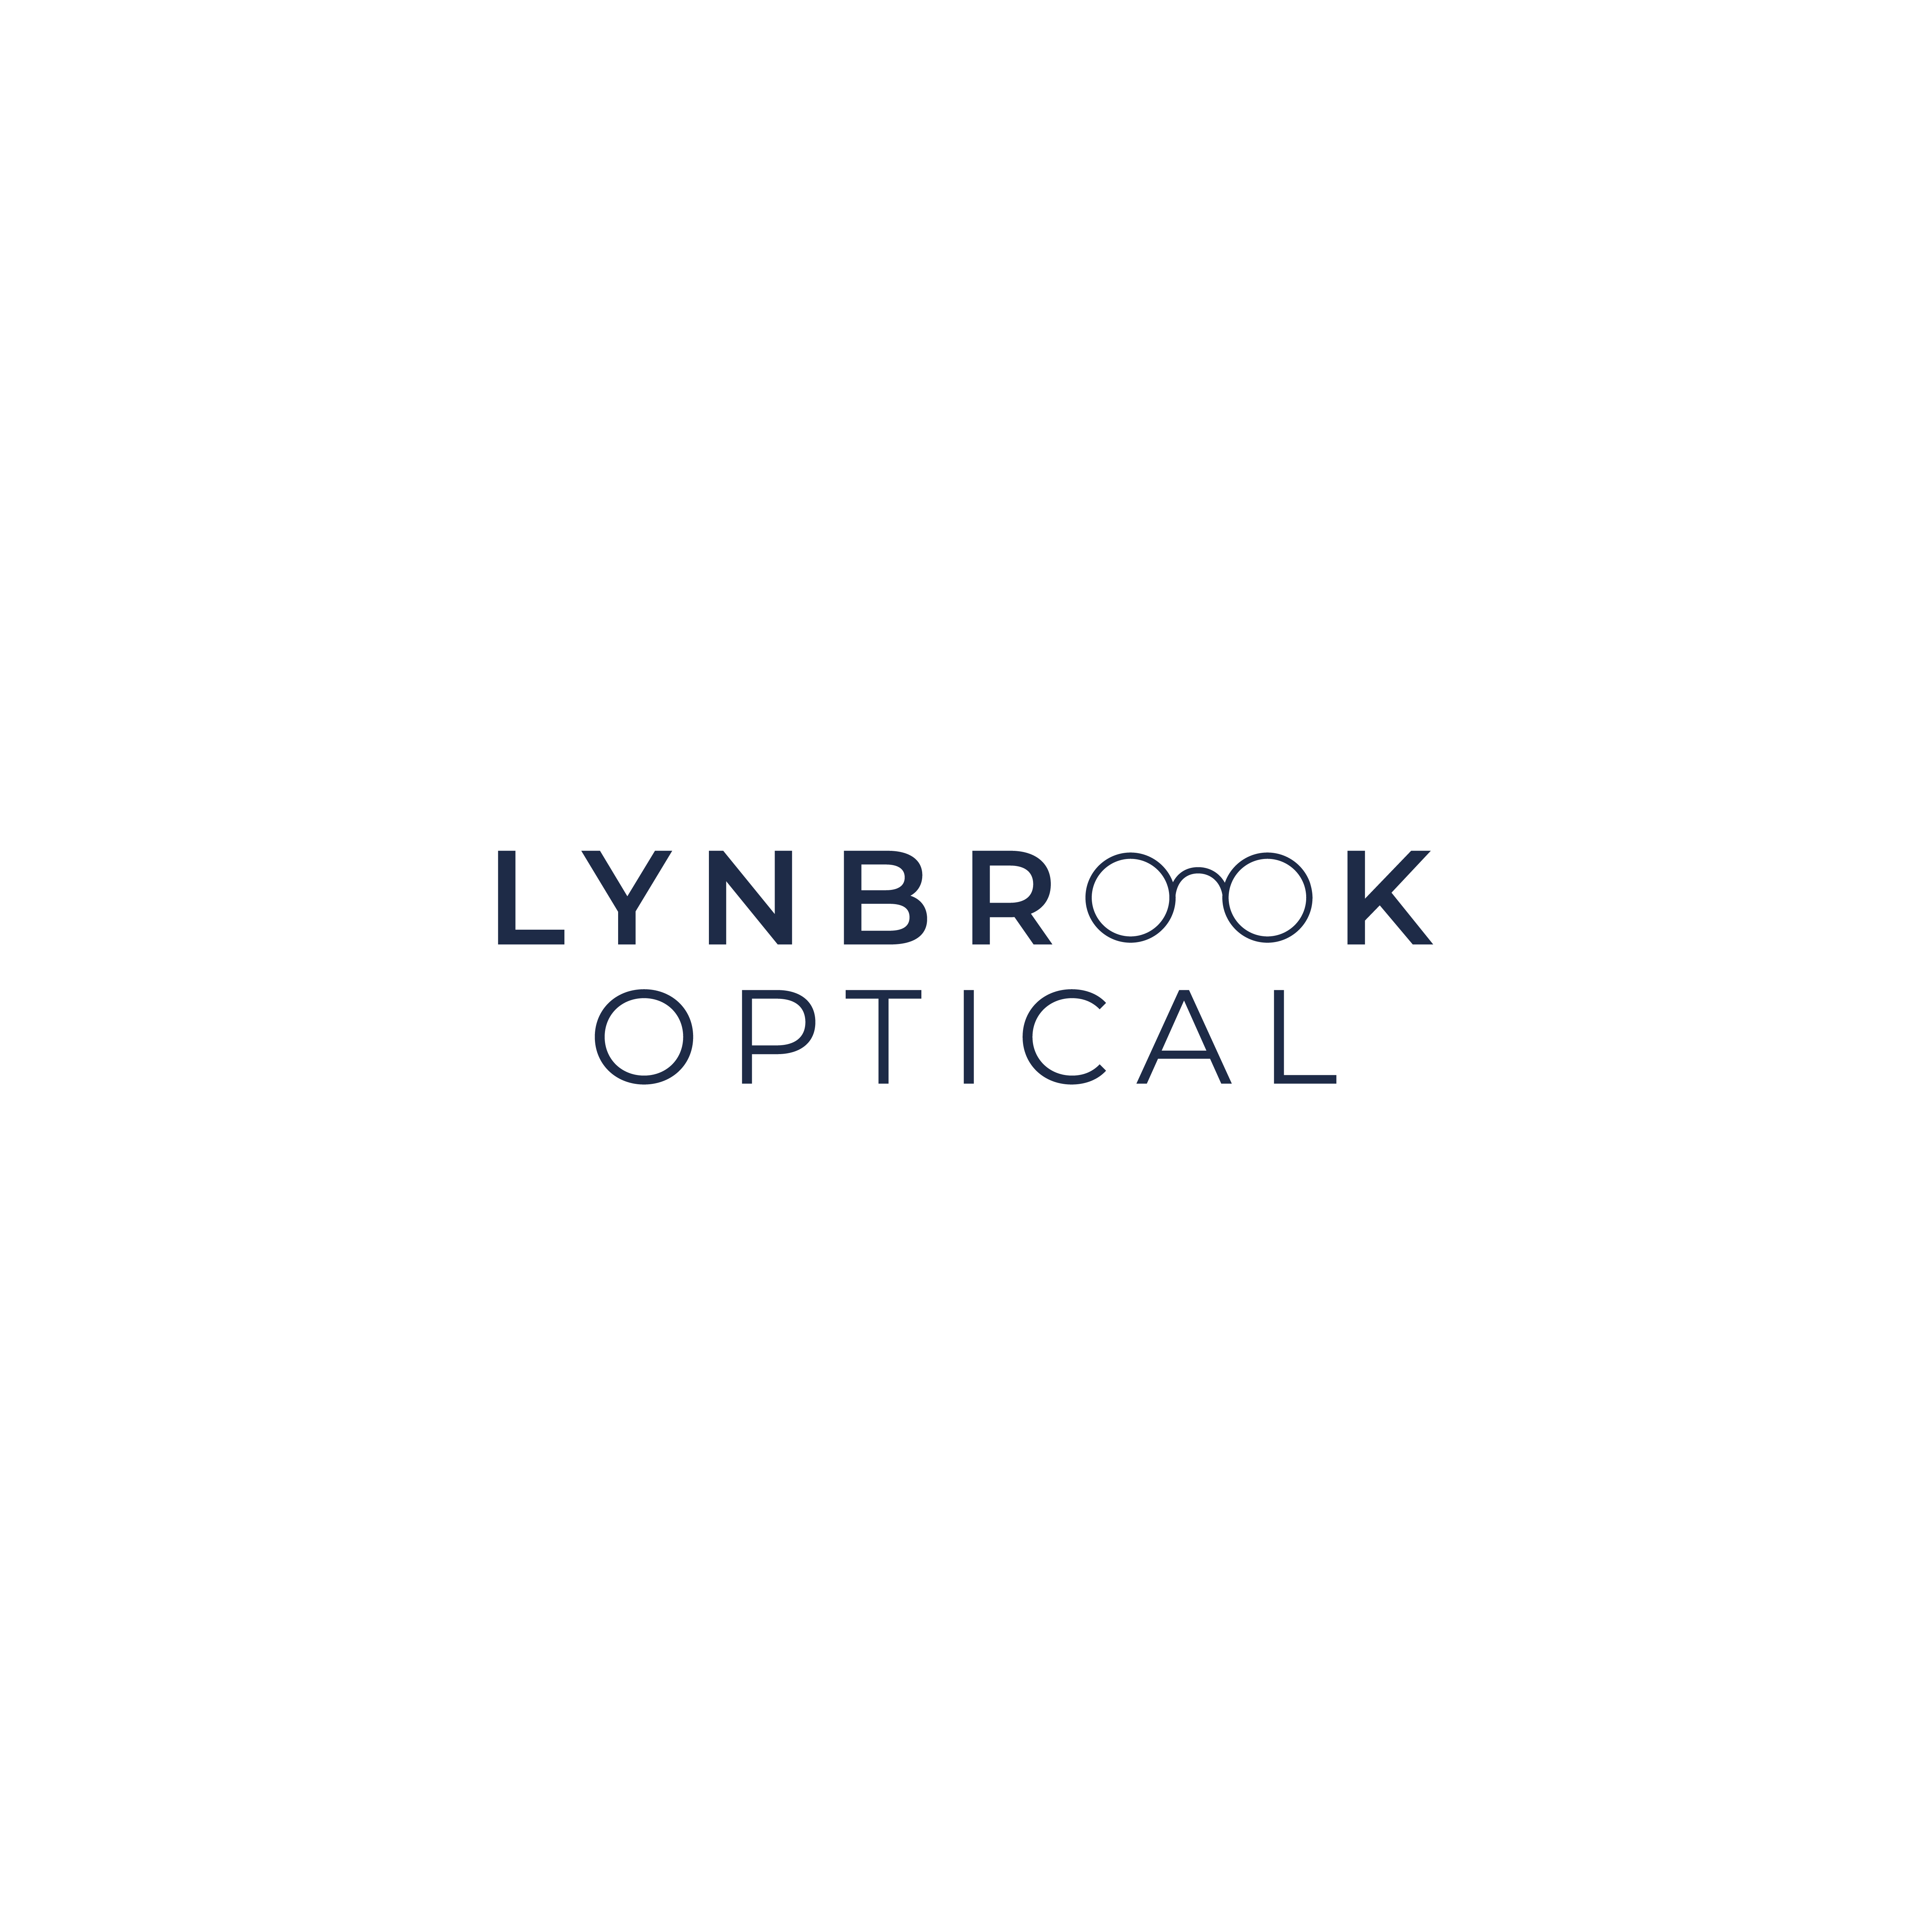 logo for Lynbrook Optical Optometrists